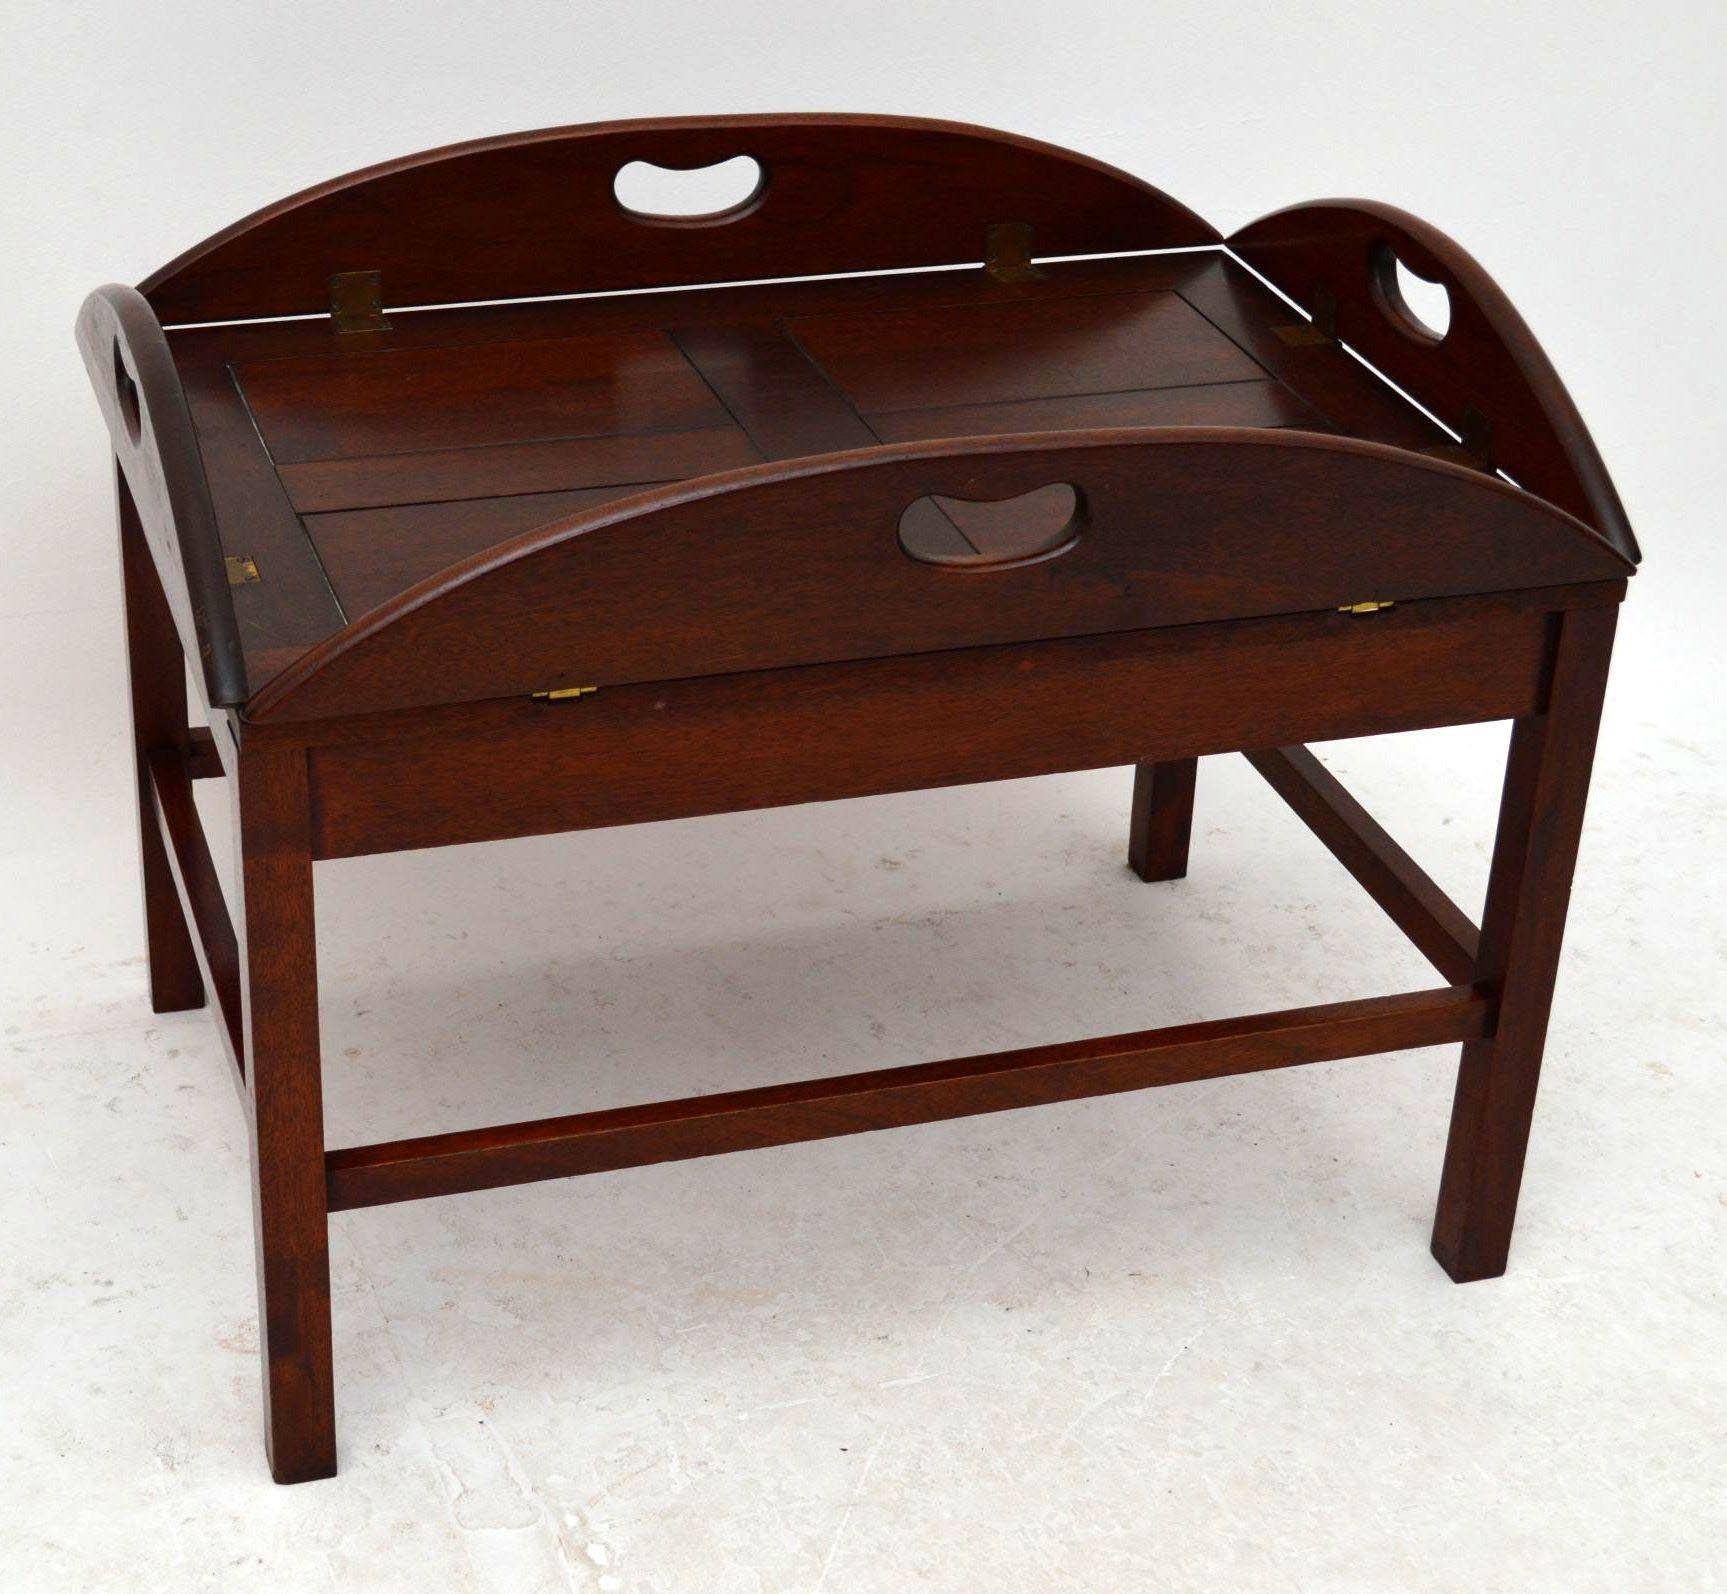 Mahogany Butler Tray Coffee Table Coffee Tables Mahogany Coffee pertaining to sizing 1727 X 1594